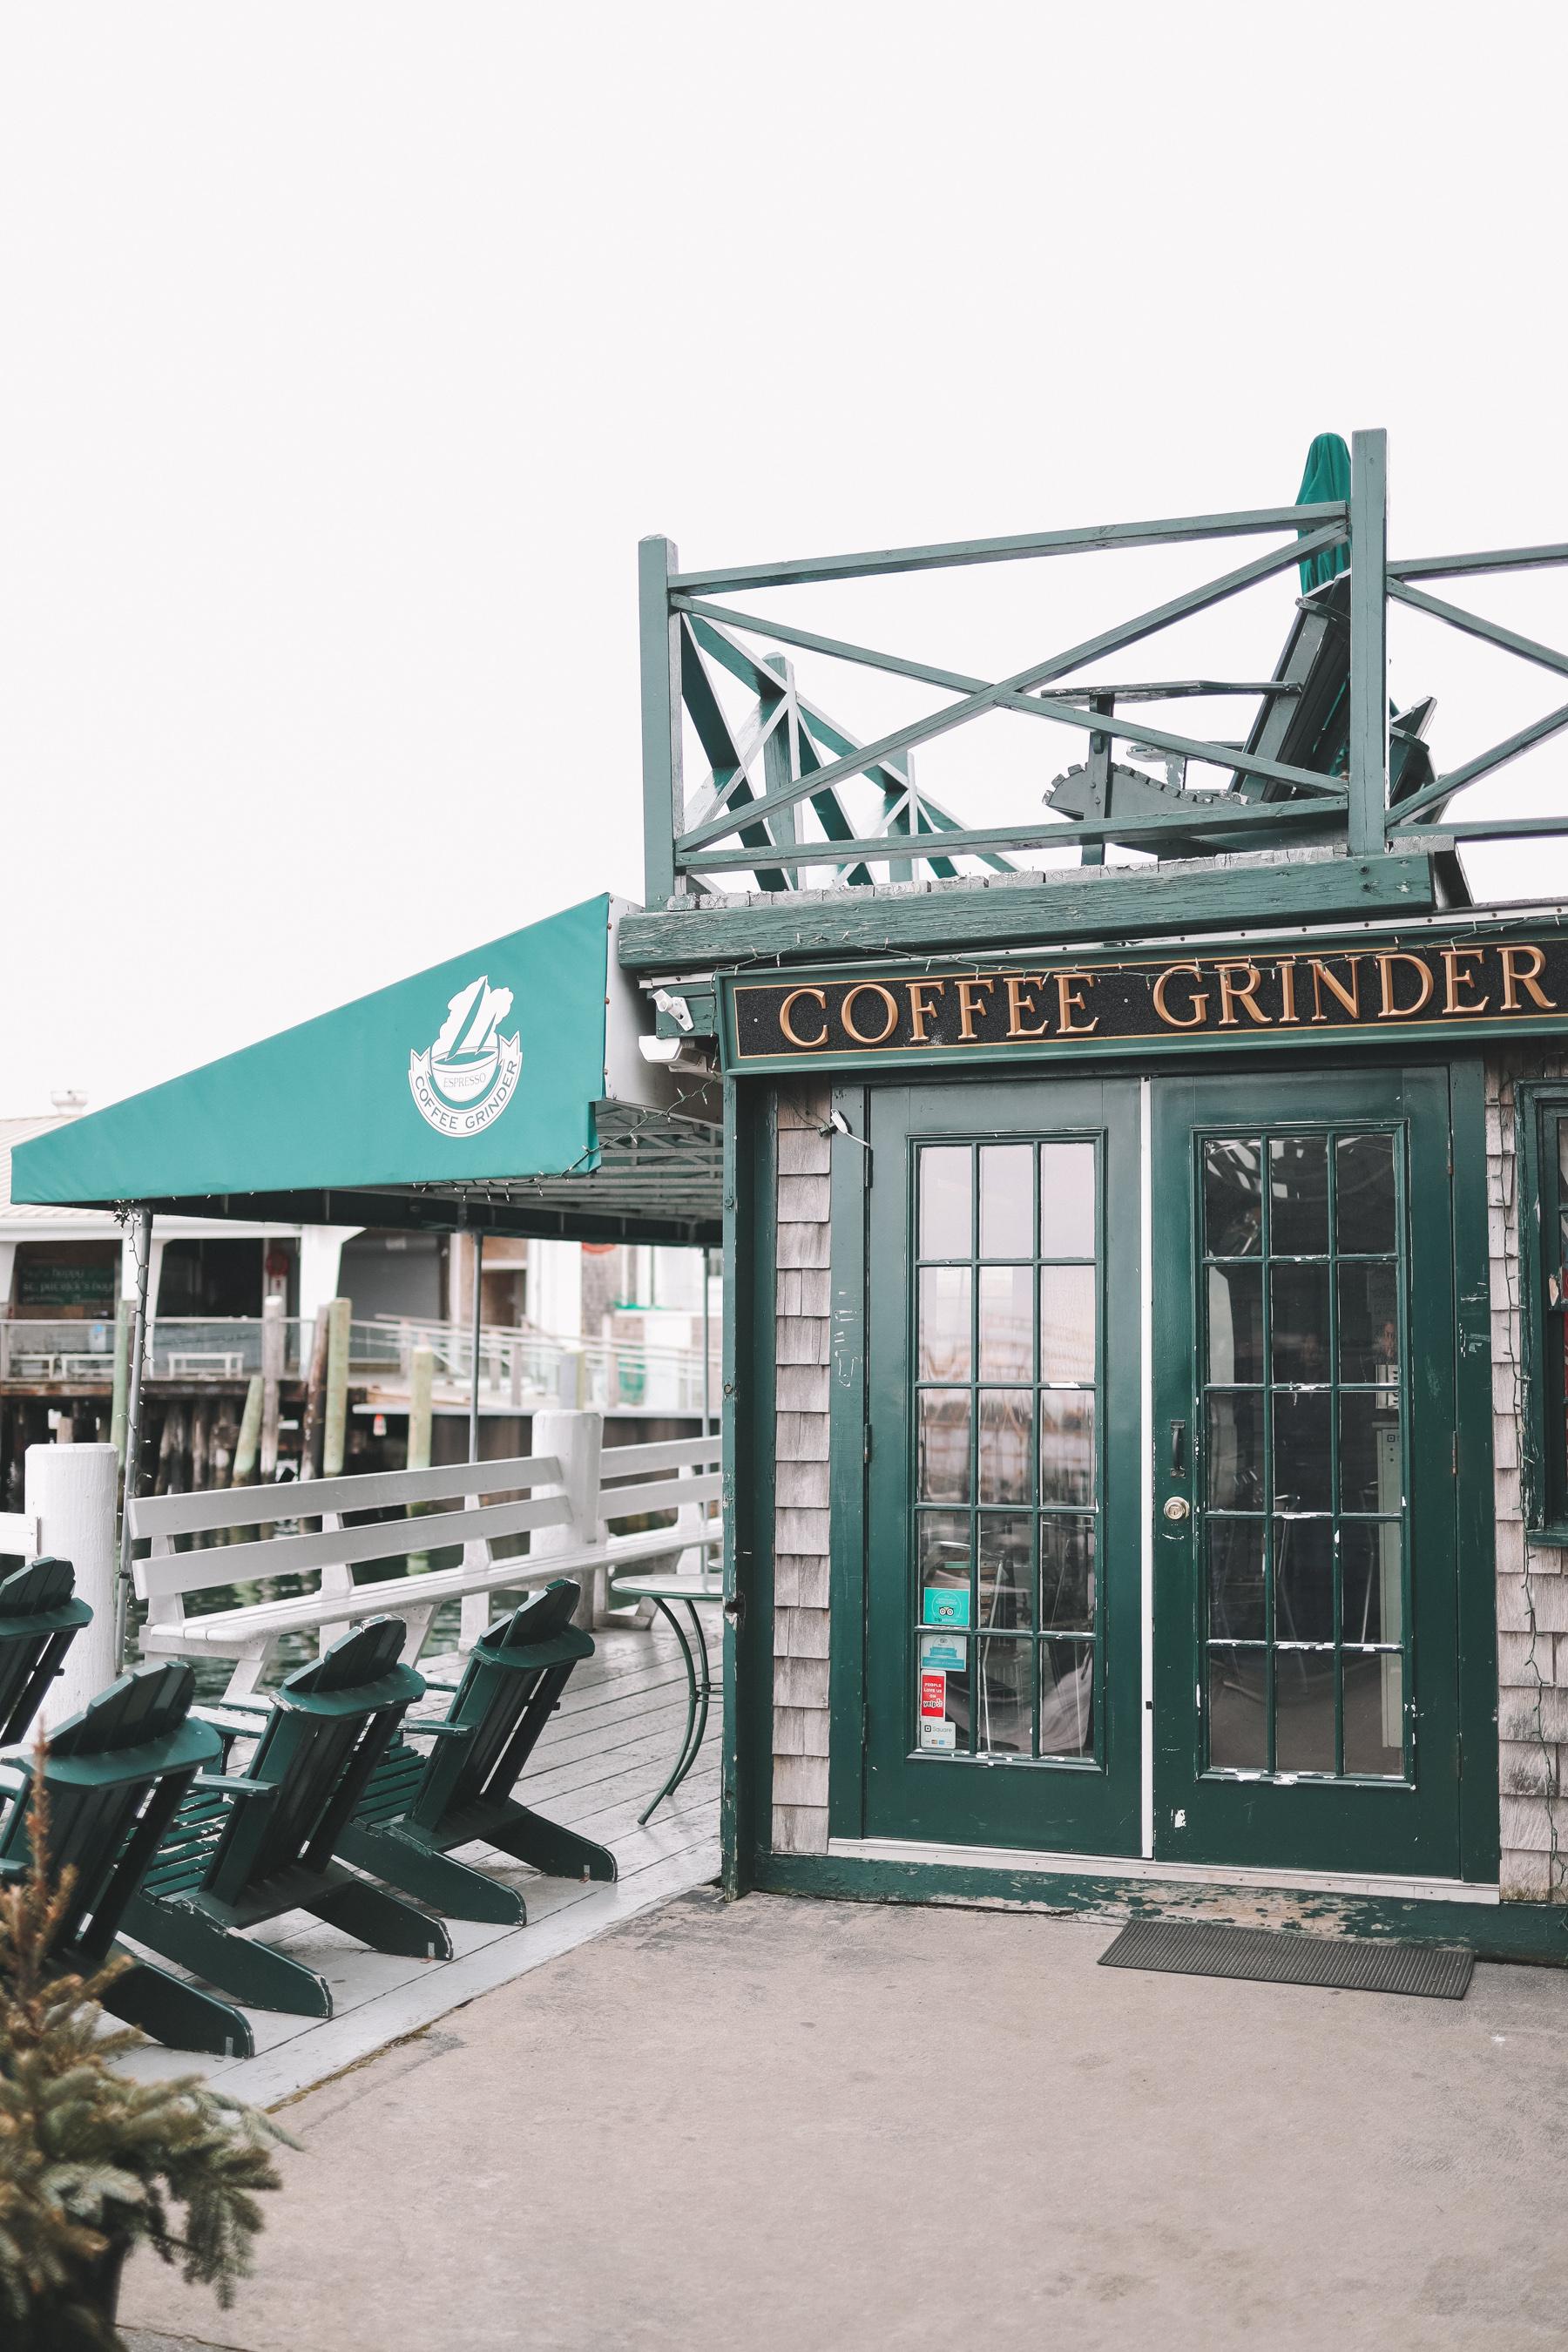 Day 1 in Newport, Rhode Island - Coffee Grinder